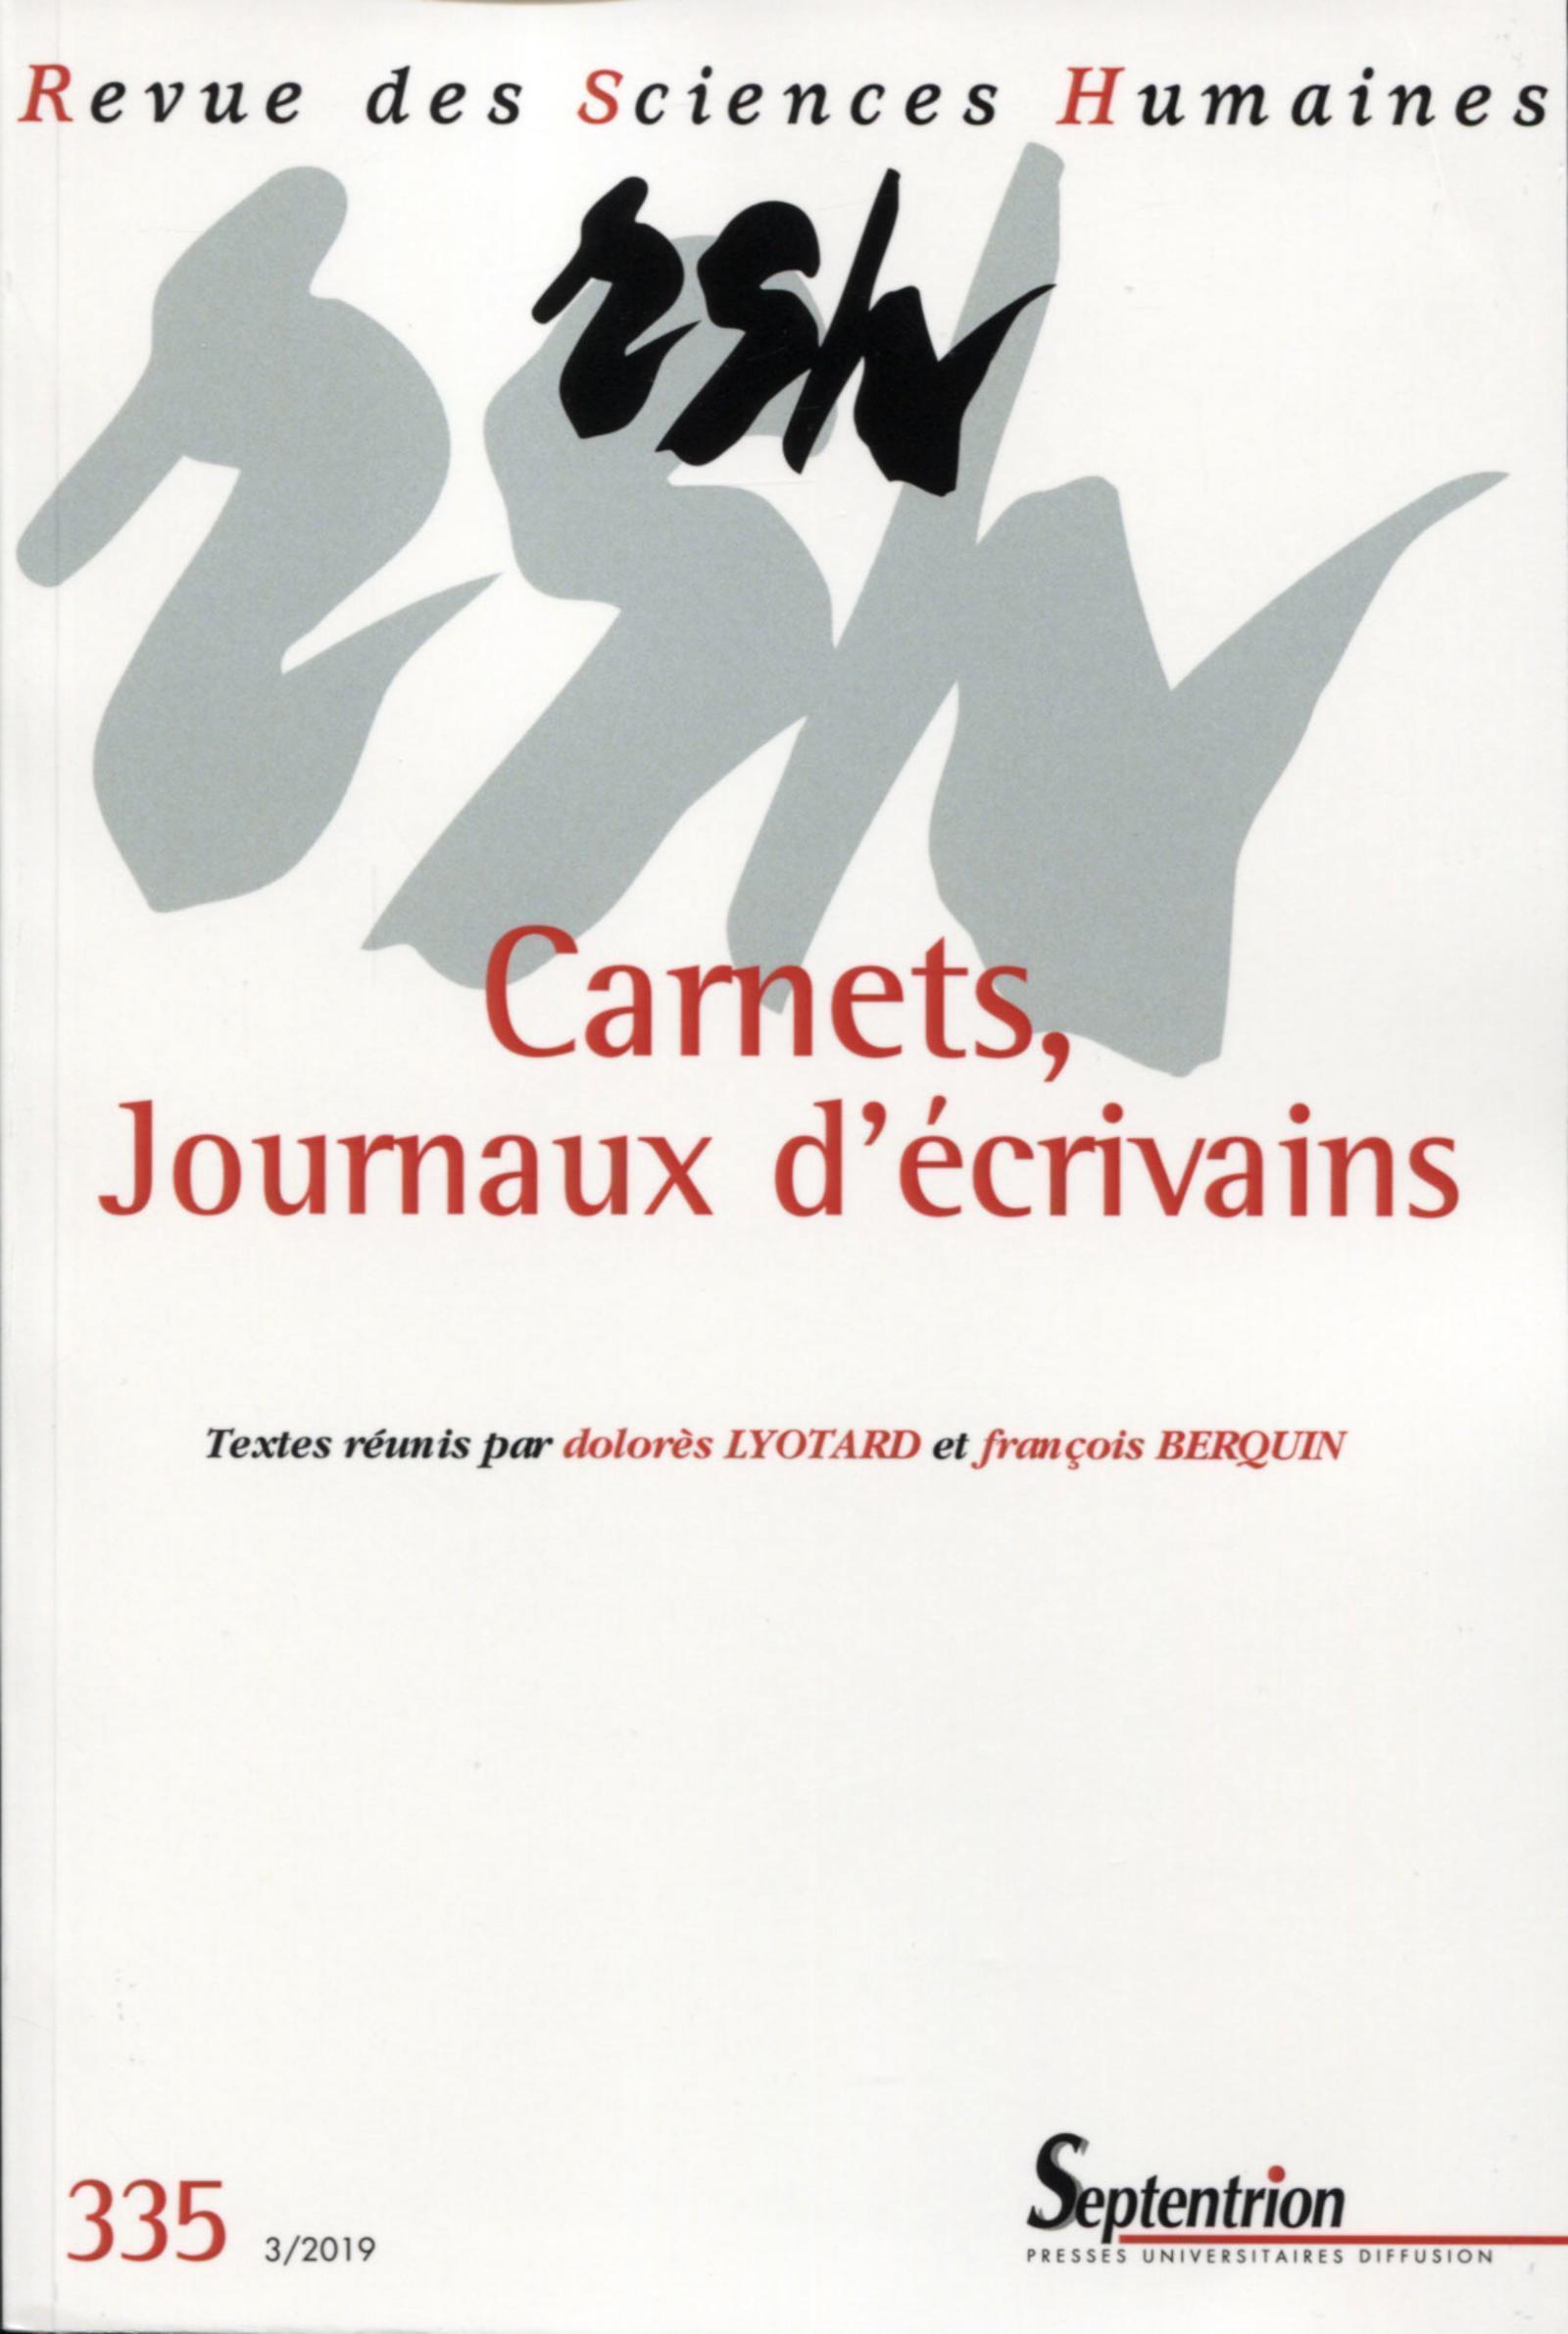 CARNETS, JOURNAUX INTIMES - REVUE DES SCIENCES HUMAINES, N 335 - 3/2019